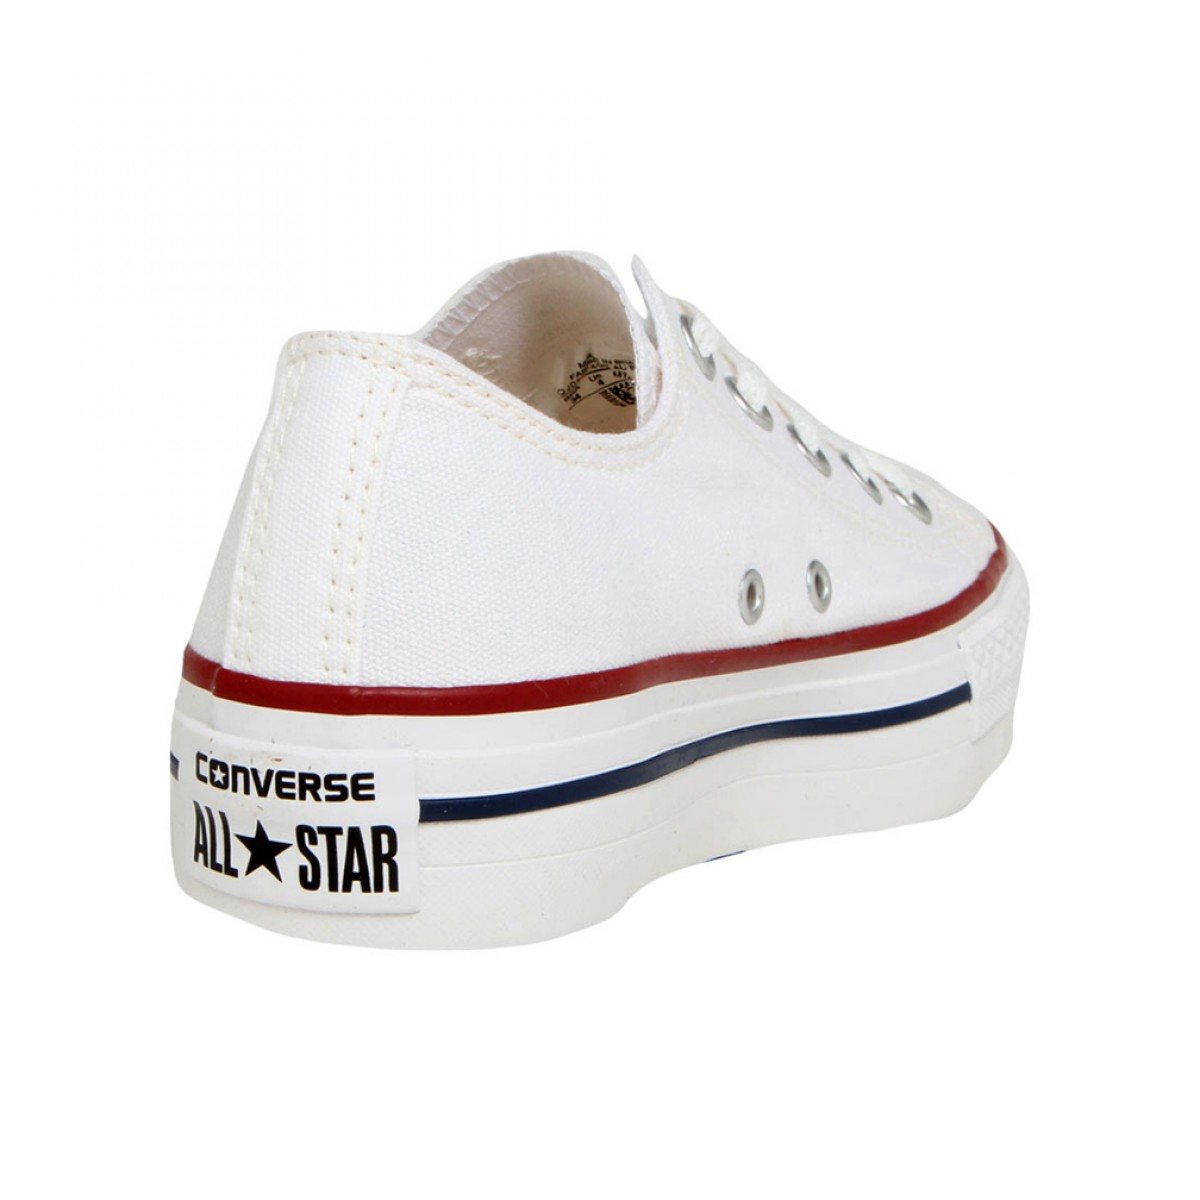 ... Tênis All Star Chuck Taylor Platform Converse Branco - Feminino ... 2e76798d55ff9